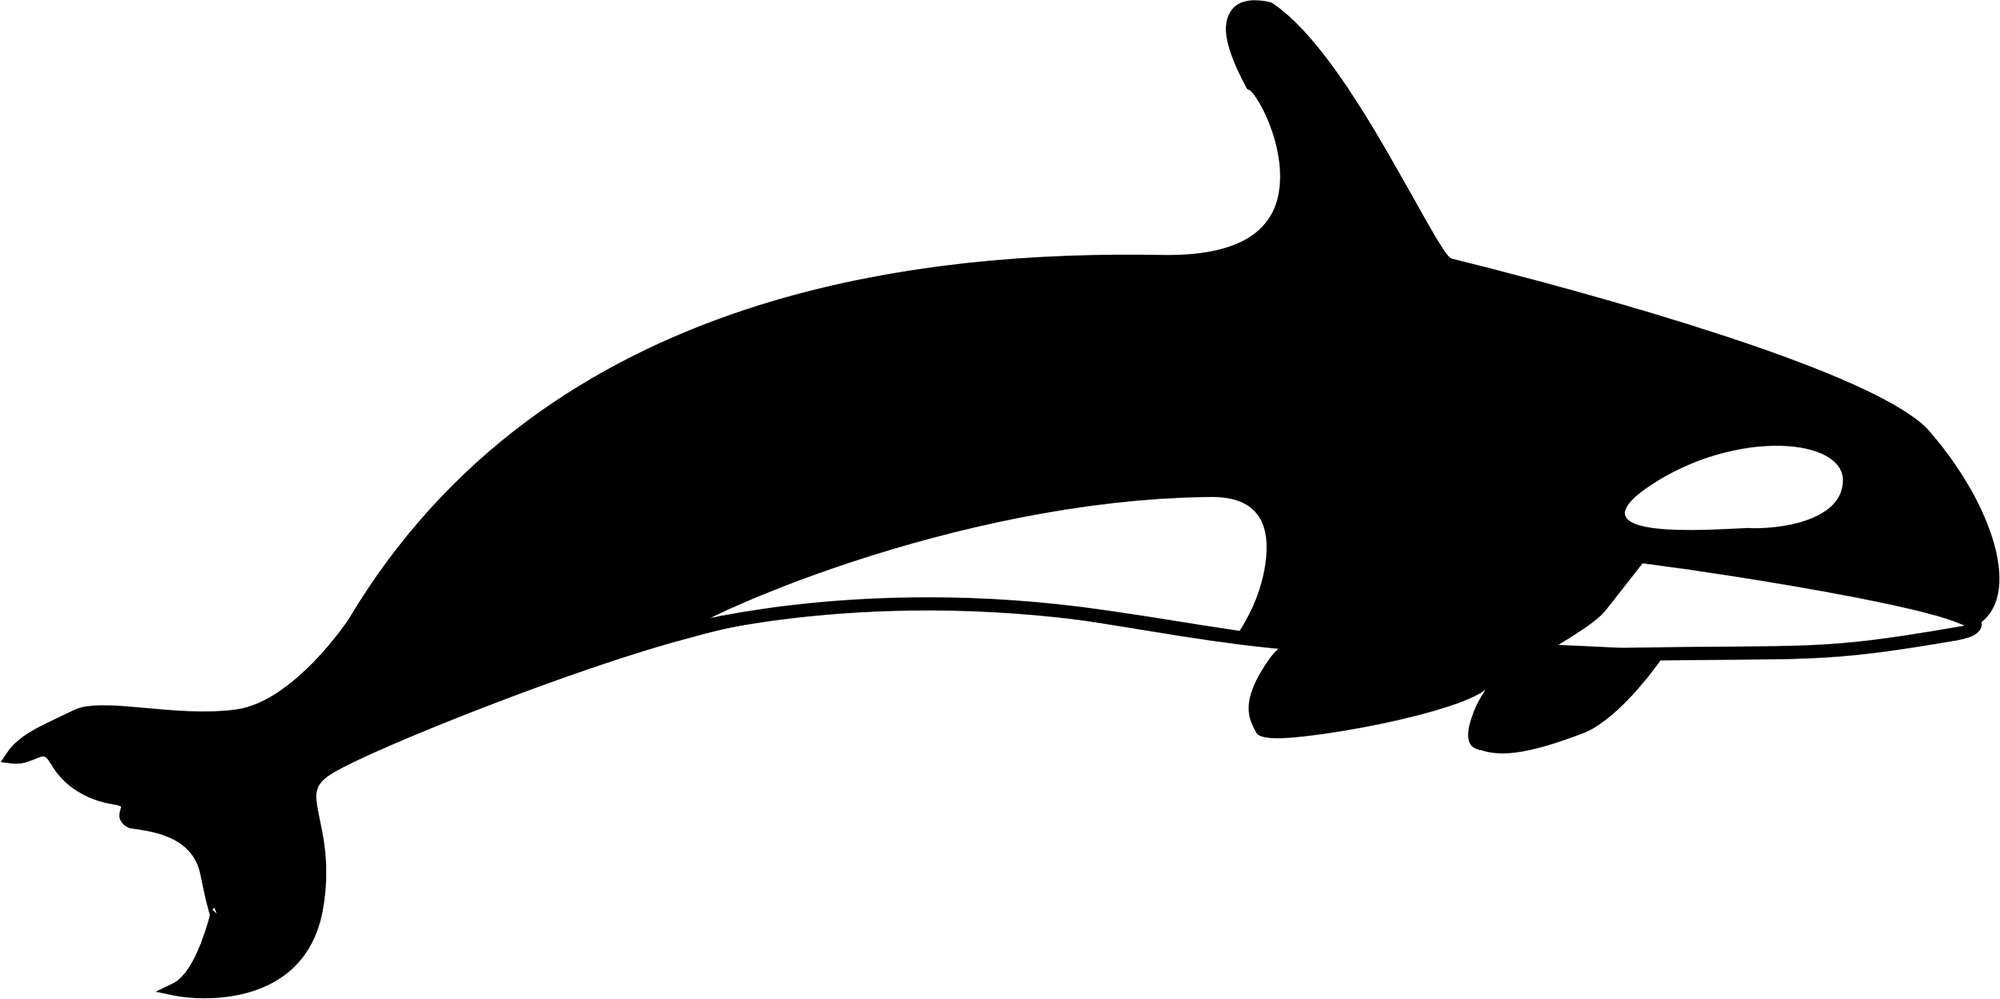 orca-transparent-svg.png